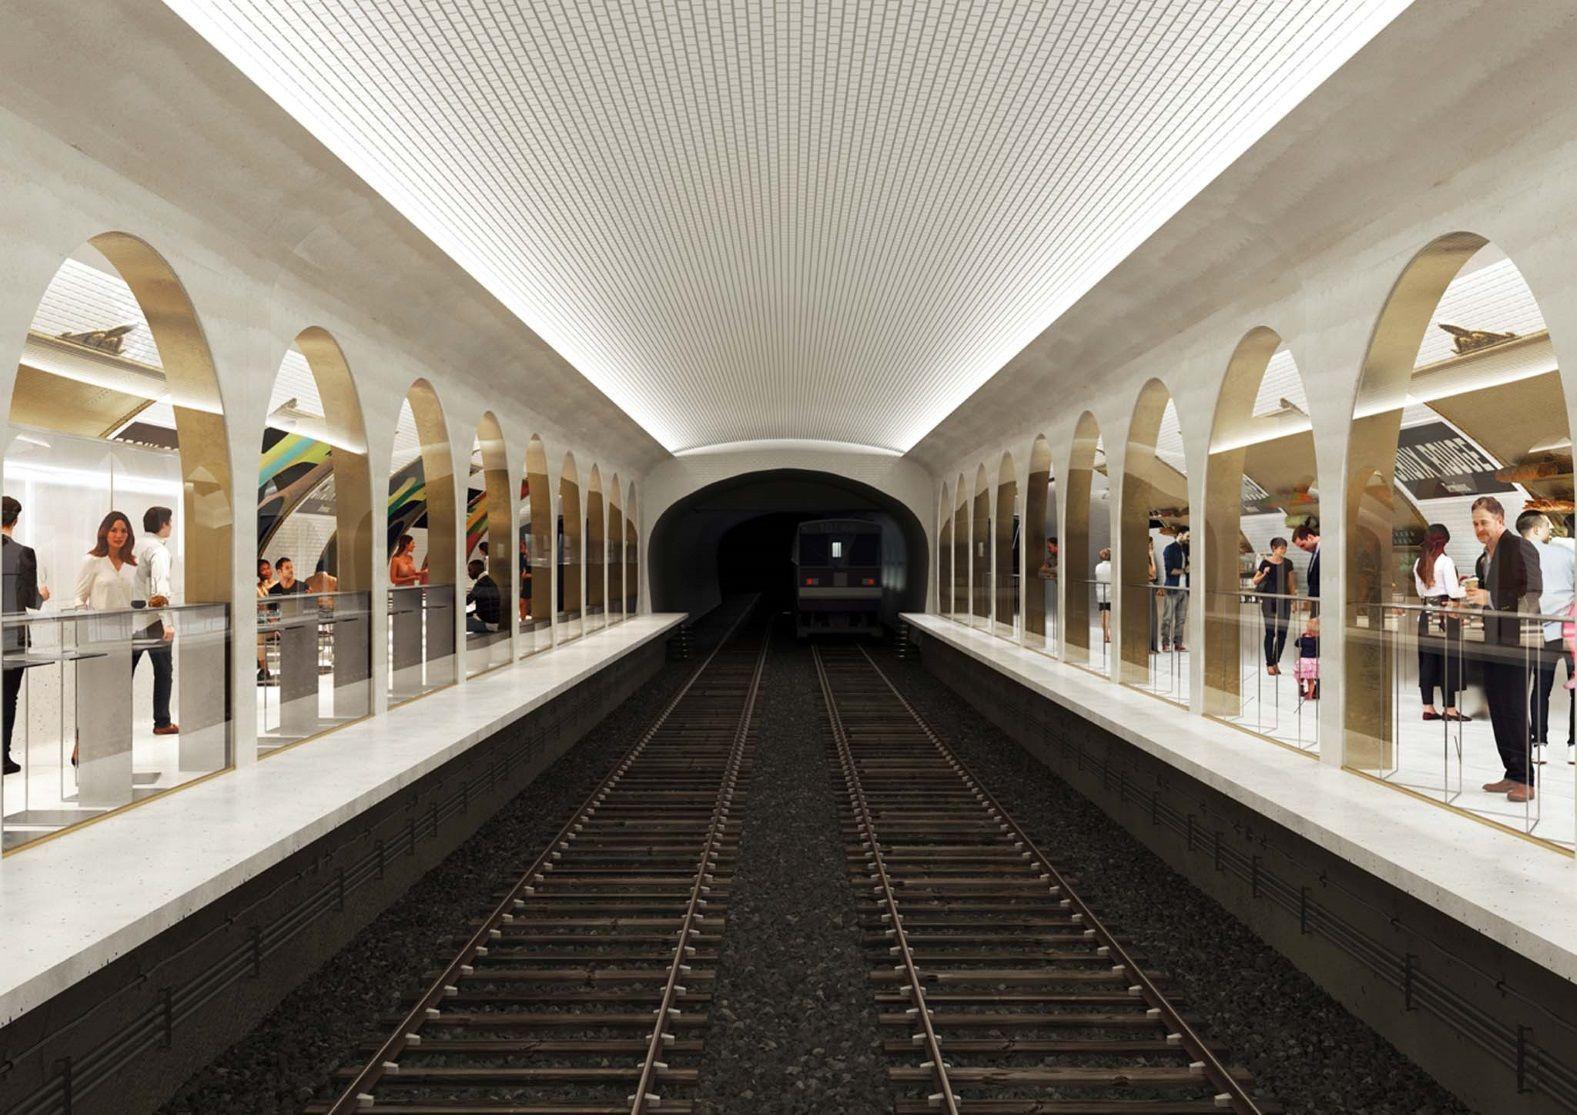 бар в метро париж